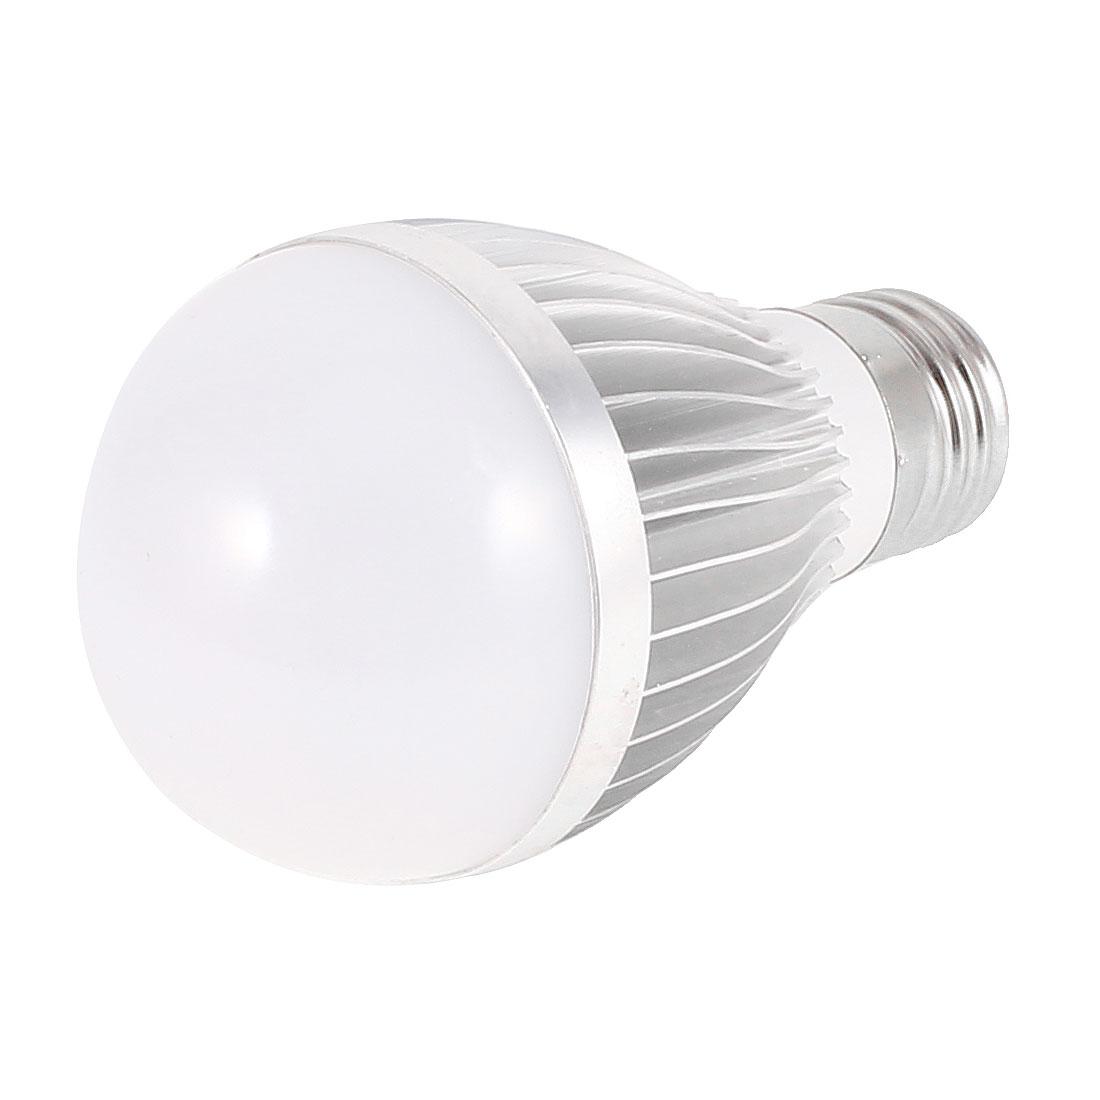 AC 86-220V 5W E27 White 5 LED Spot Globe Ball Light Bulb Lamp